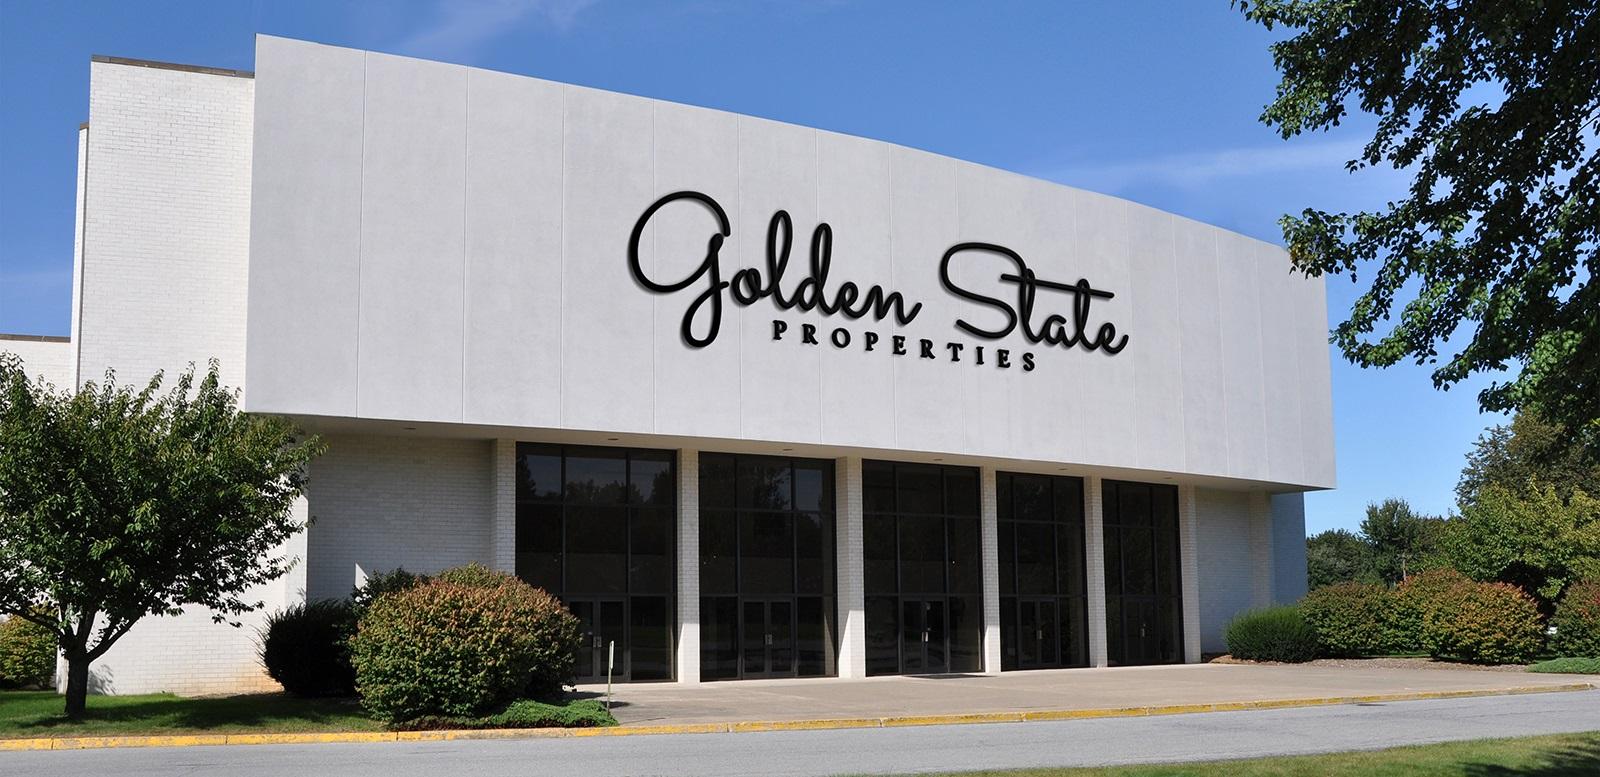 Golden_StateBuildingM (2)